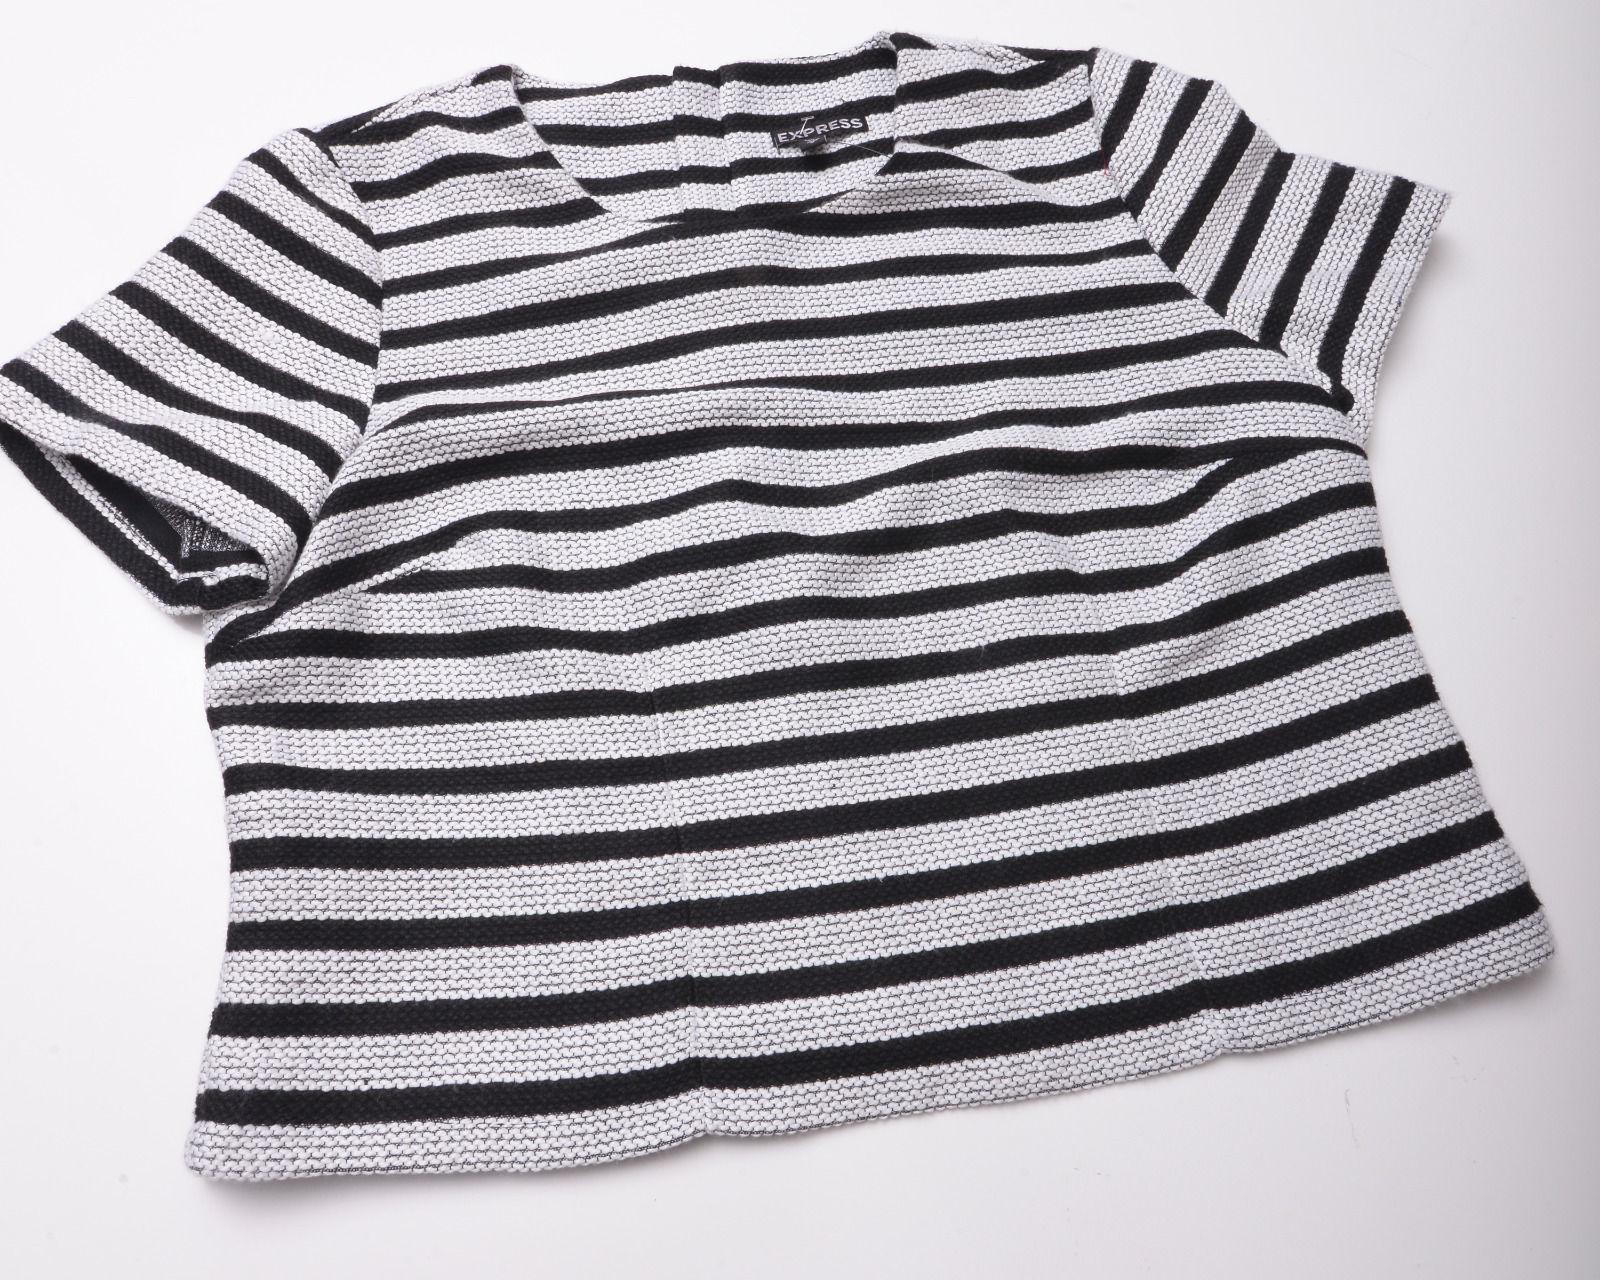 NEW EXPRESS Womens SHIRT TOP Size Medium Black White Zipped Back